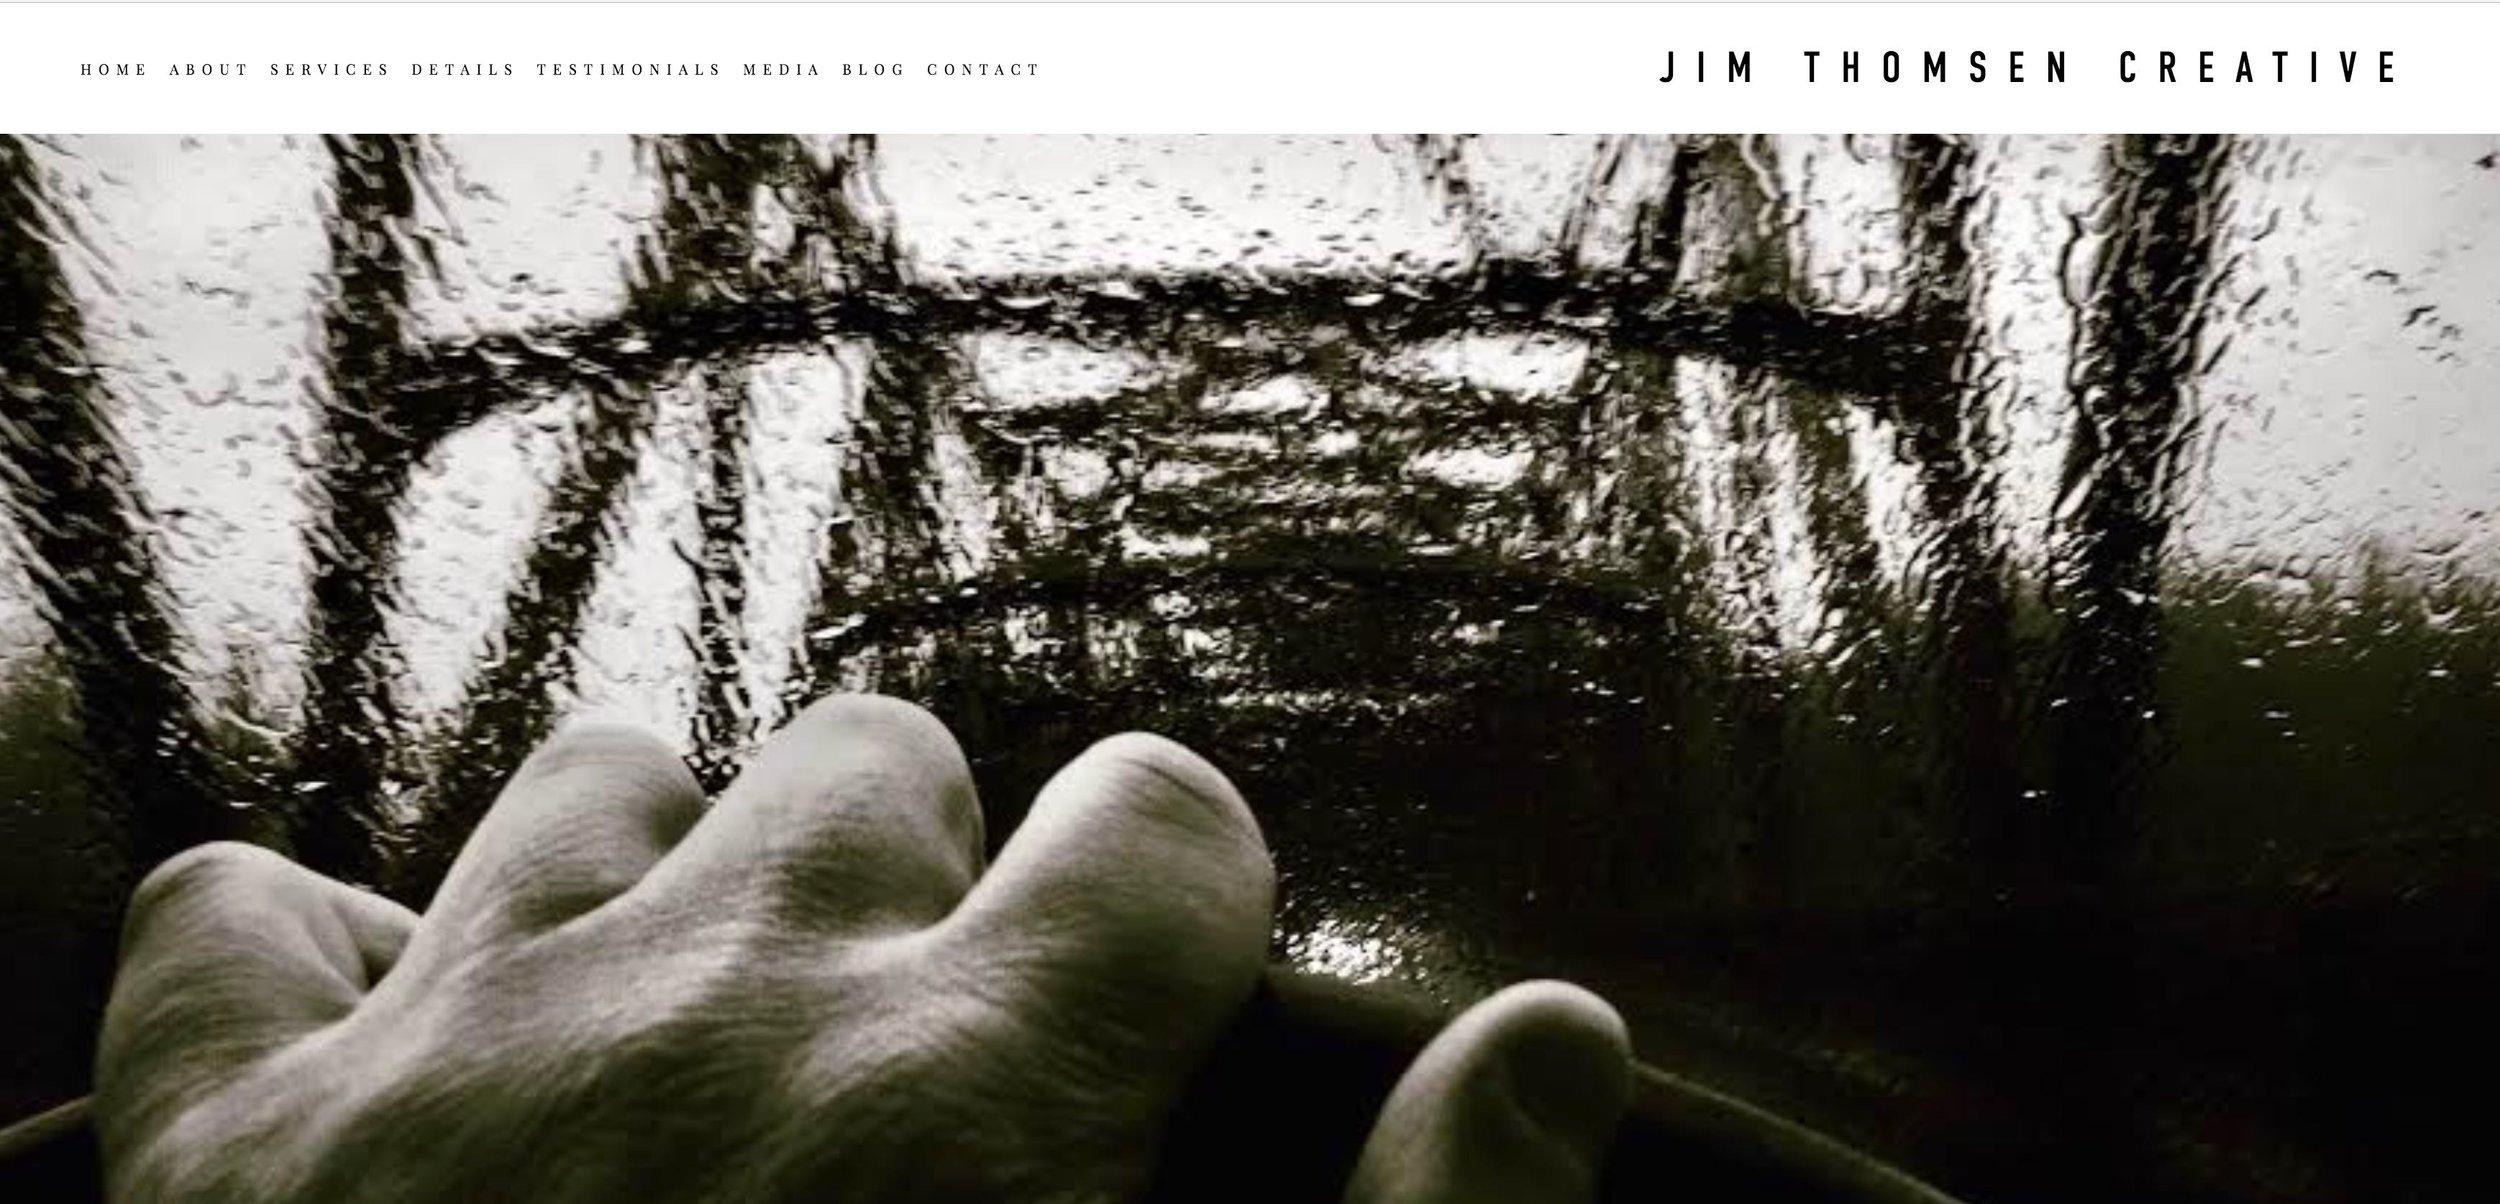 Jim Thompson Creative